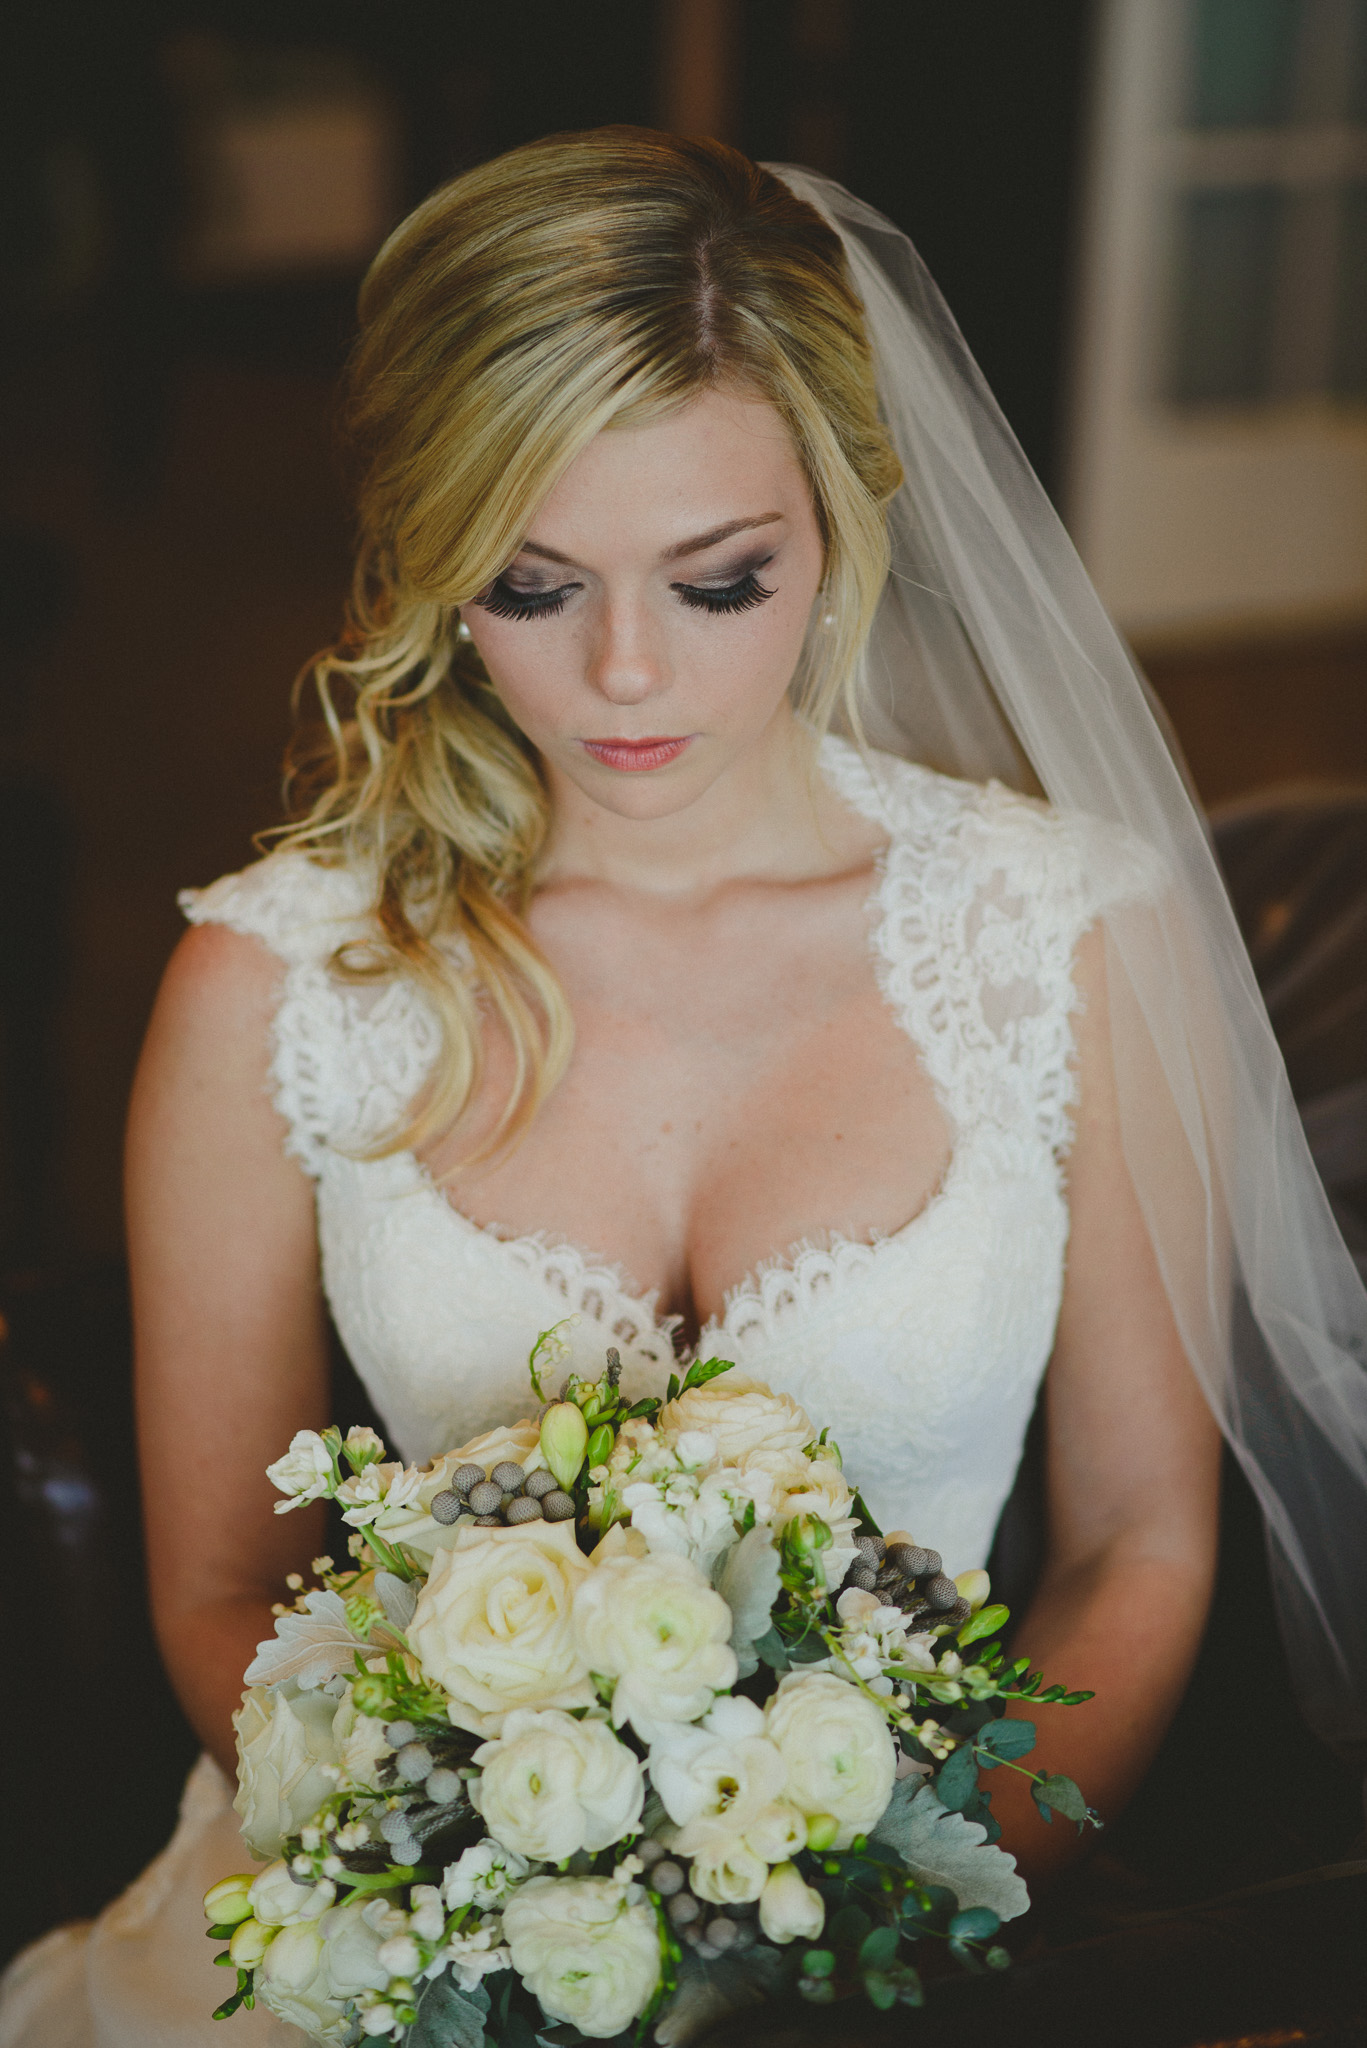 Savannah Wedding - Classic Bridal